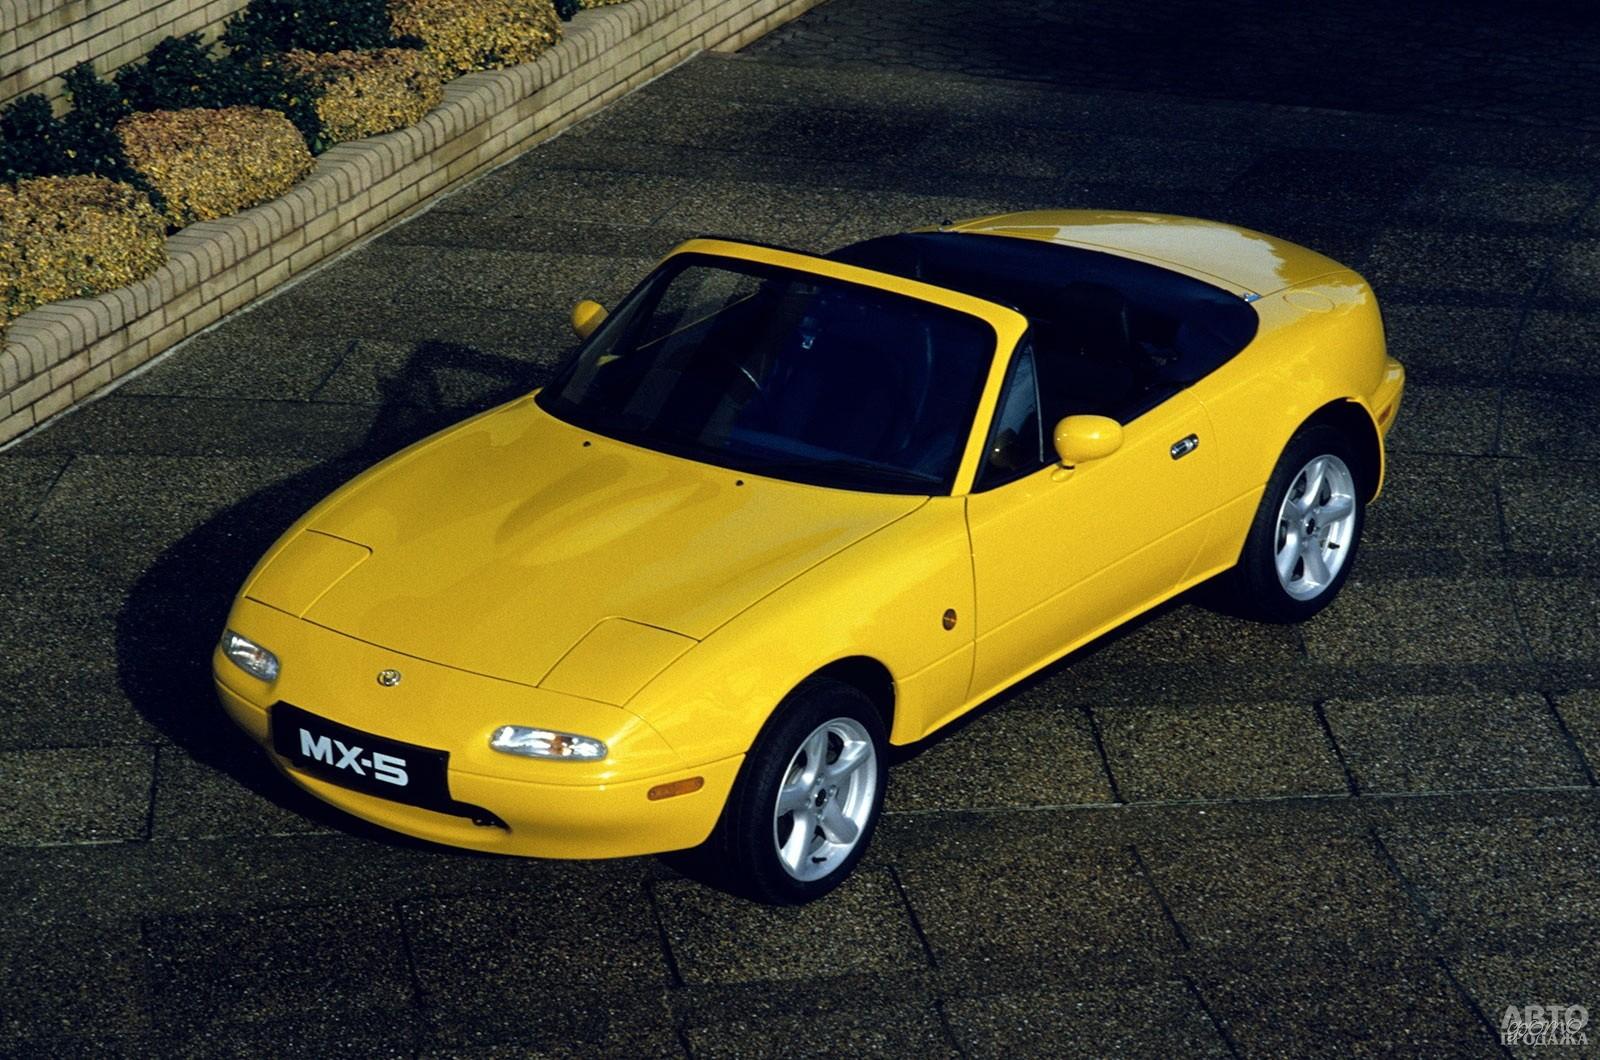 Лимитированная версия Mаzda MX-5 California, 1996 год